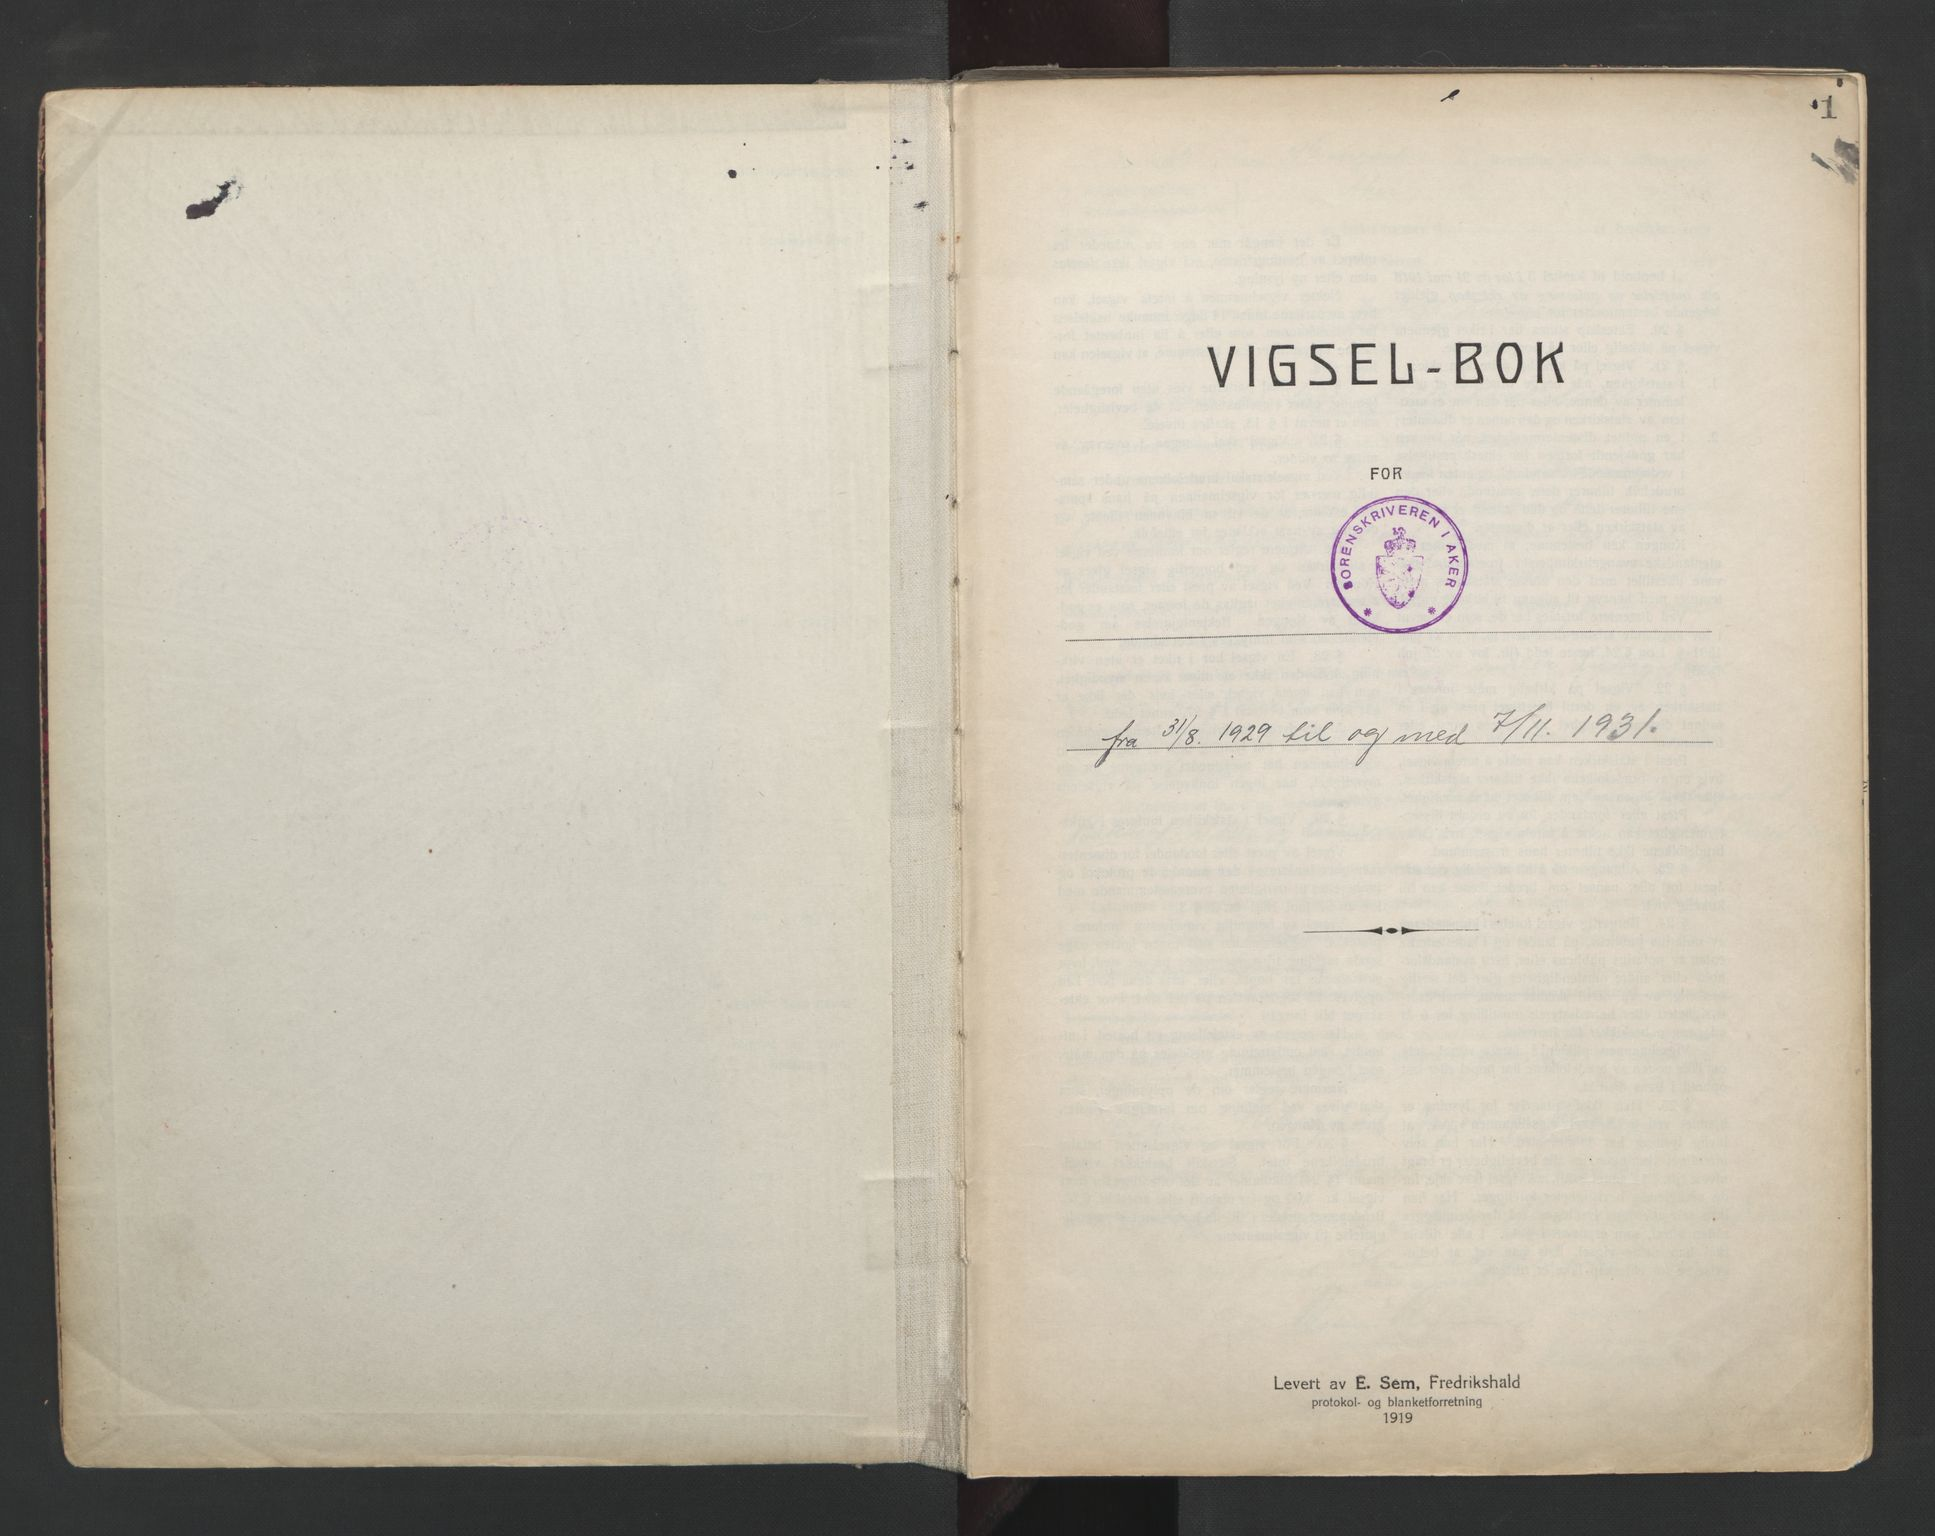 SAO, Aker sorenskriveri, L/Lc/Lcb/L0005: Vigselprotokoll, 1929-1931, s. 1